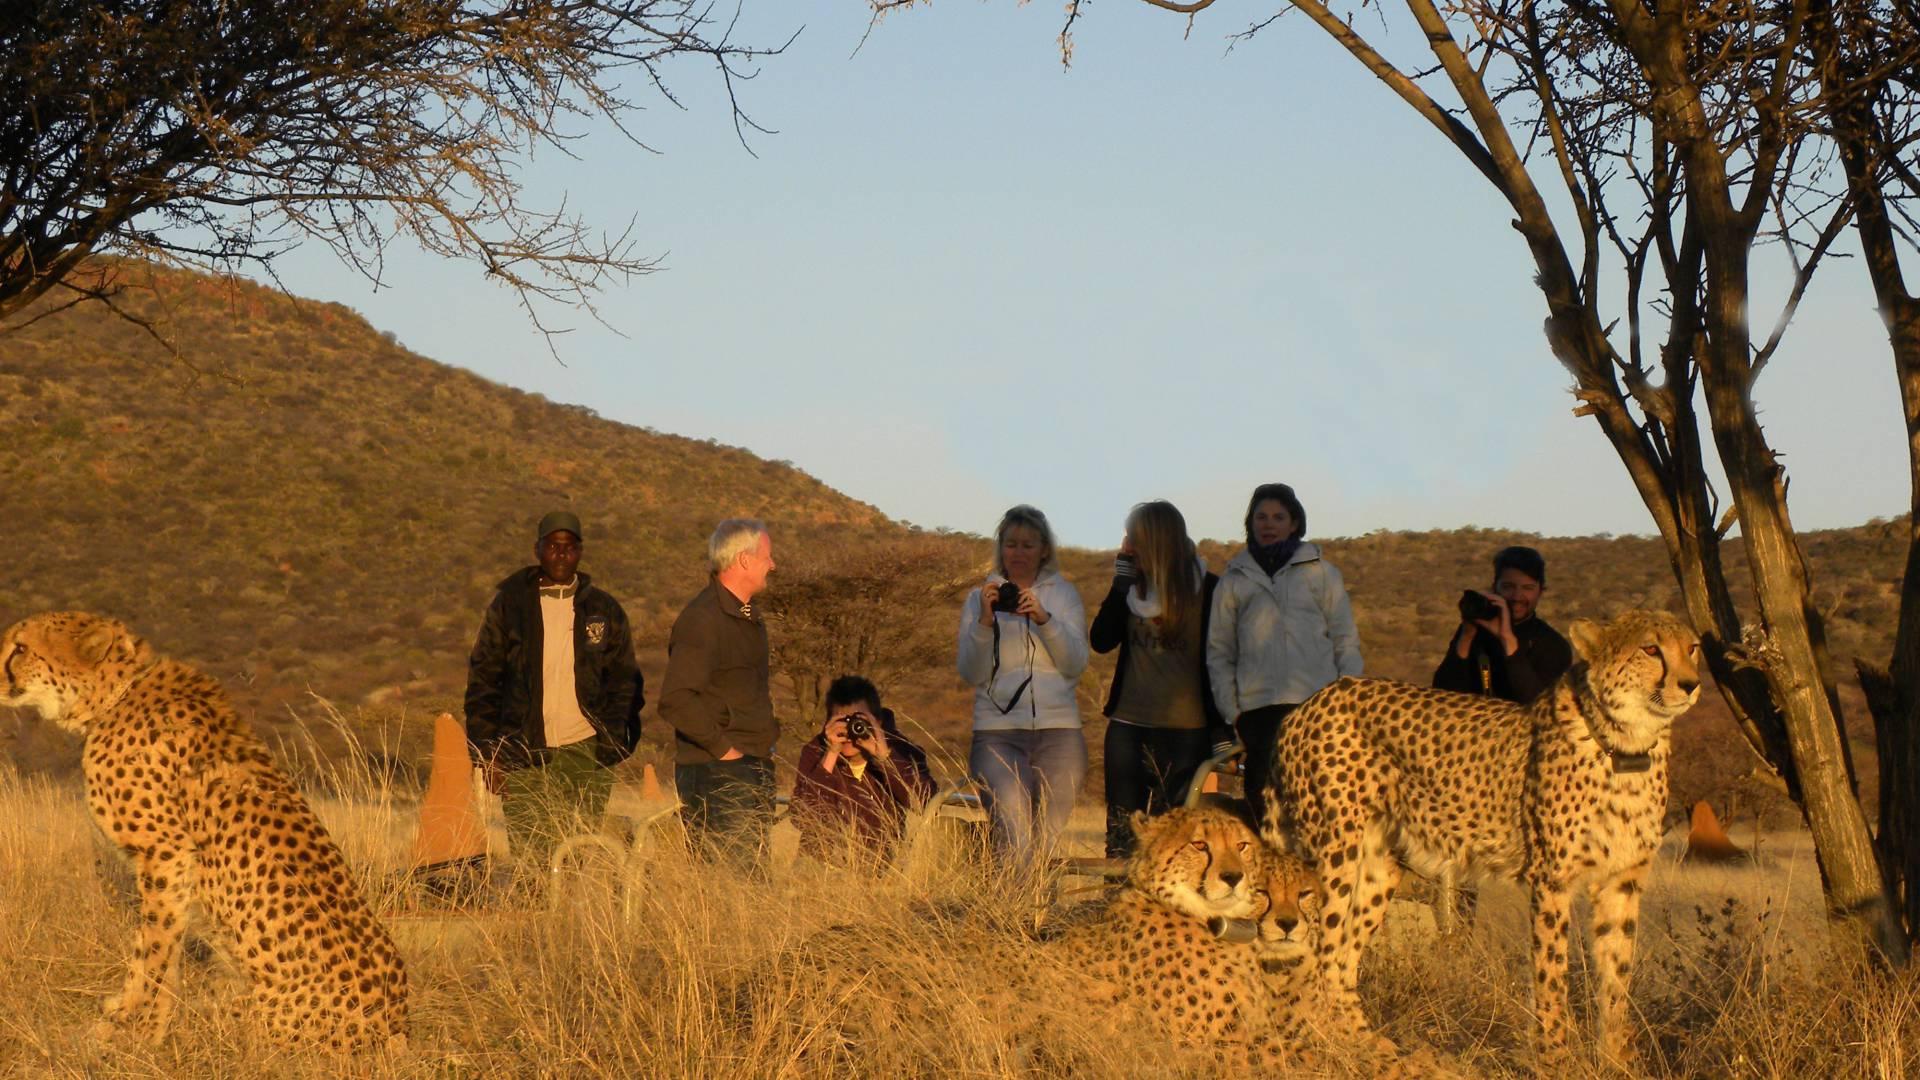 Okonjima Cheetah